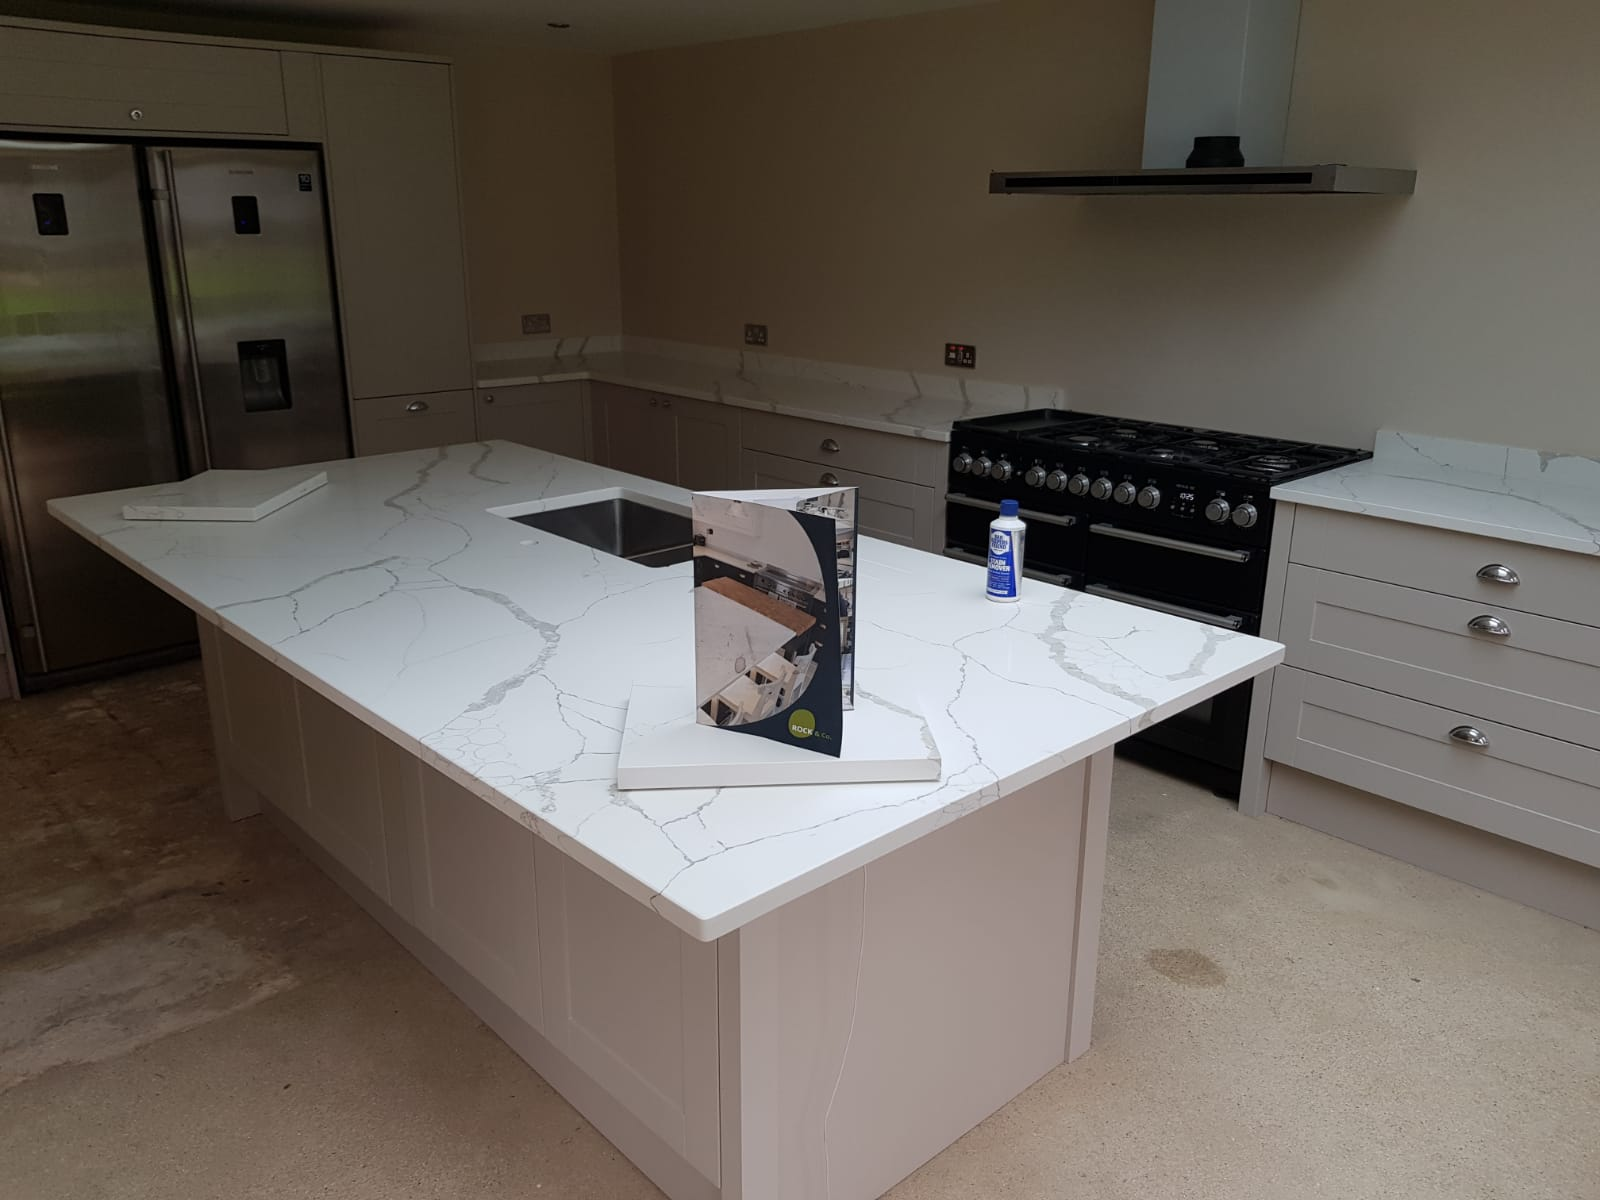 Kitchen of the week… Located in Stevenage, Herts, showcasing the Calacutta Statuario